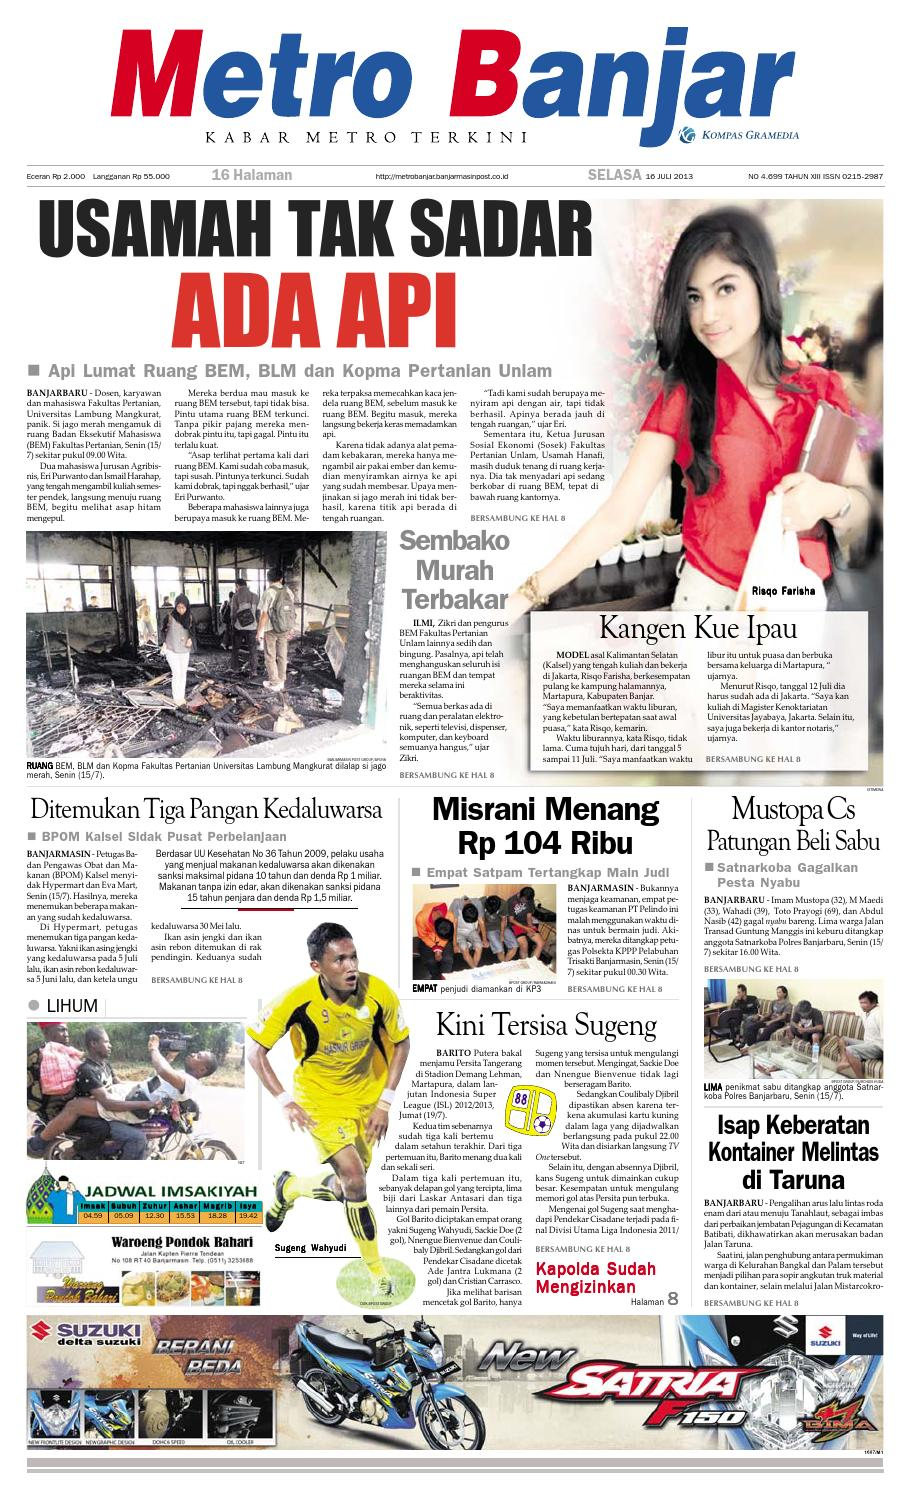 Metro Banjar Selasa 16 Juli 2013 By Harian Issuu Sepatu Olahraga Lari Lokal  Fans Veloz N